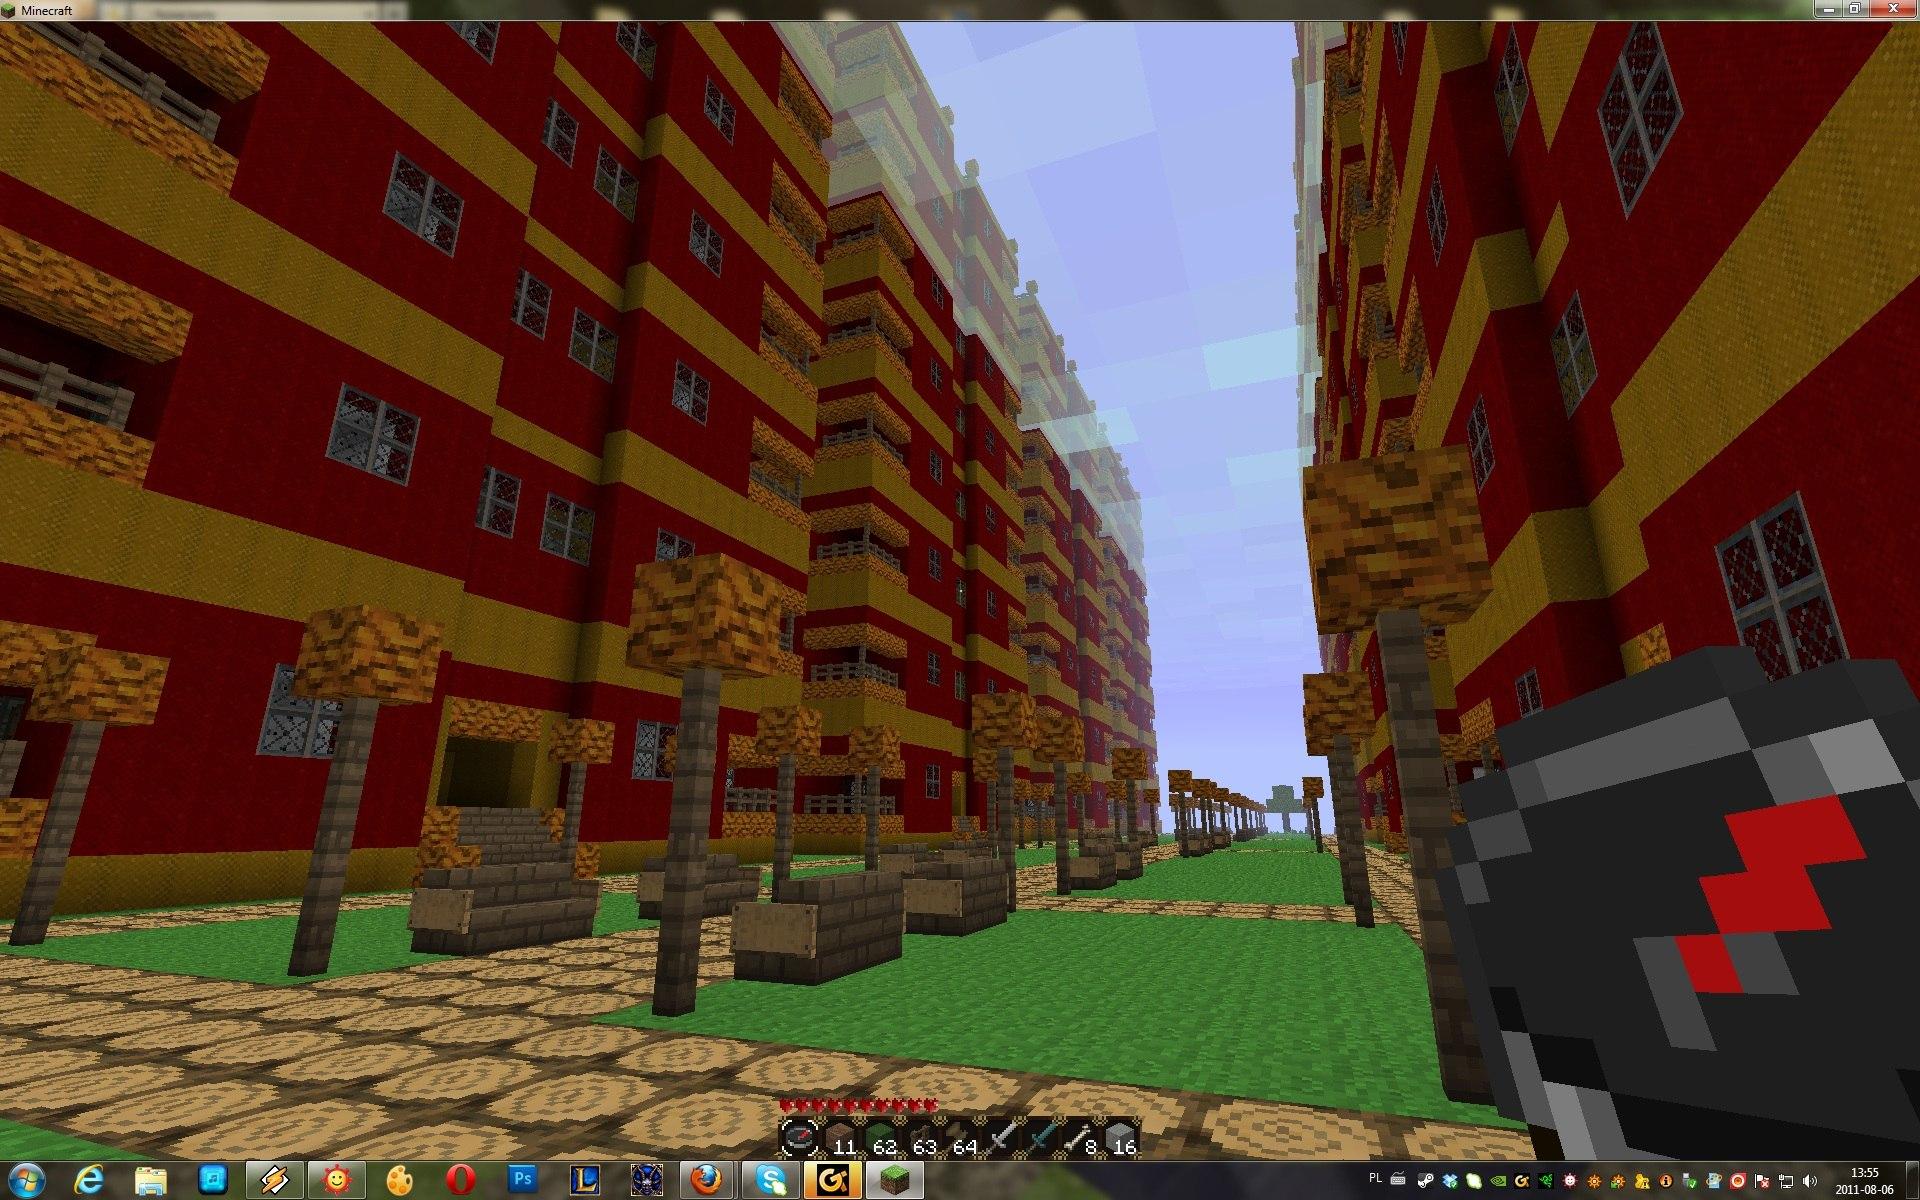 mieszkania-minecraft